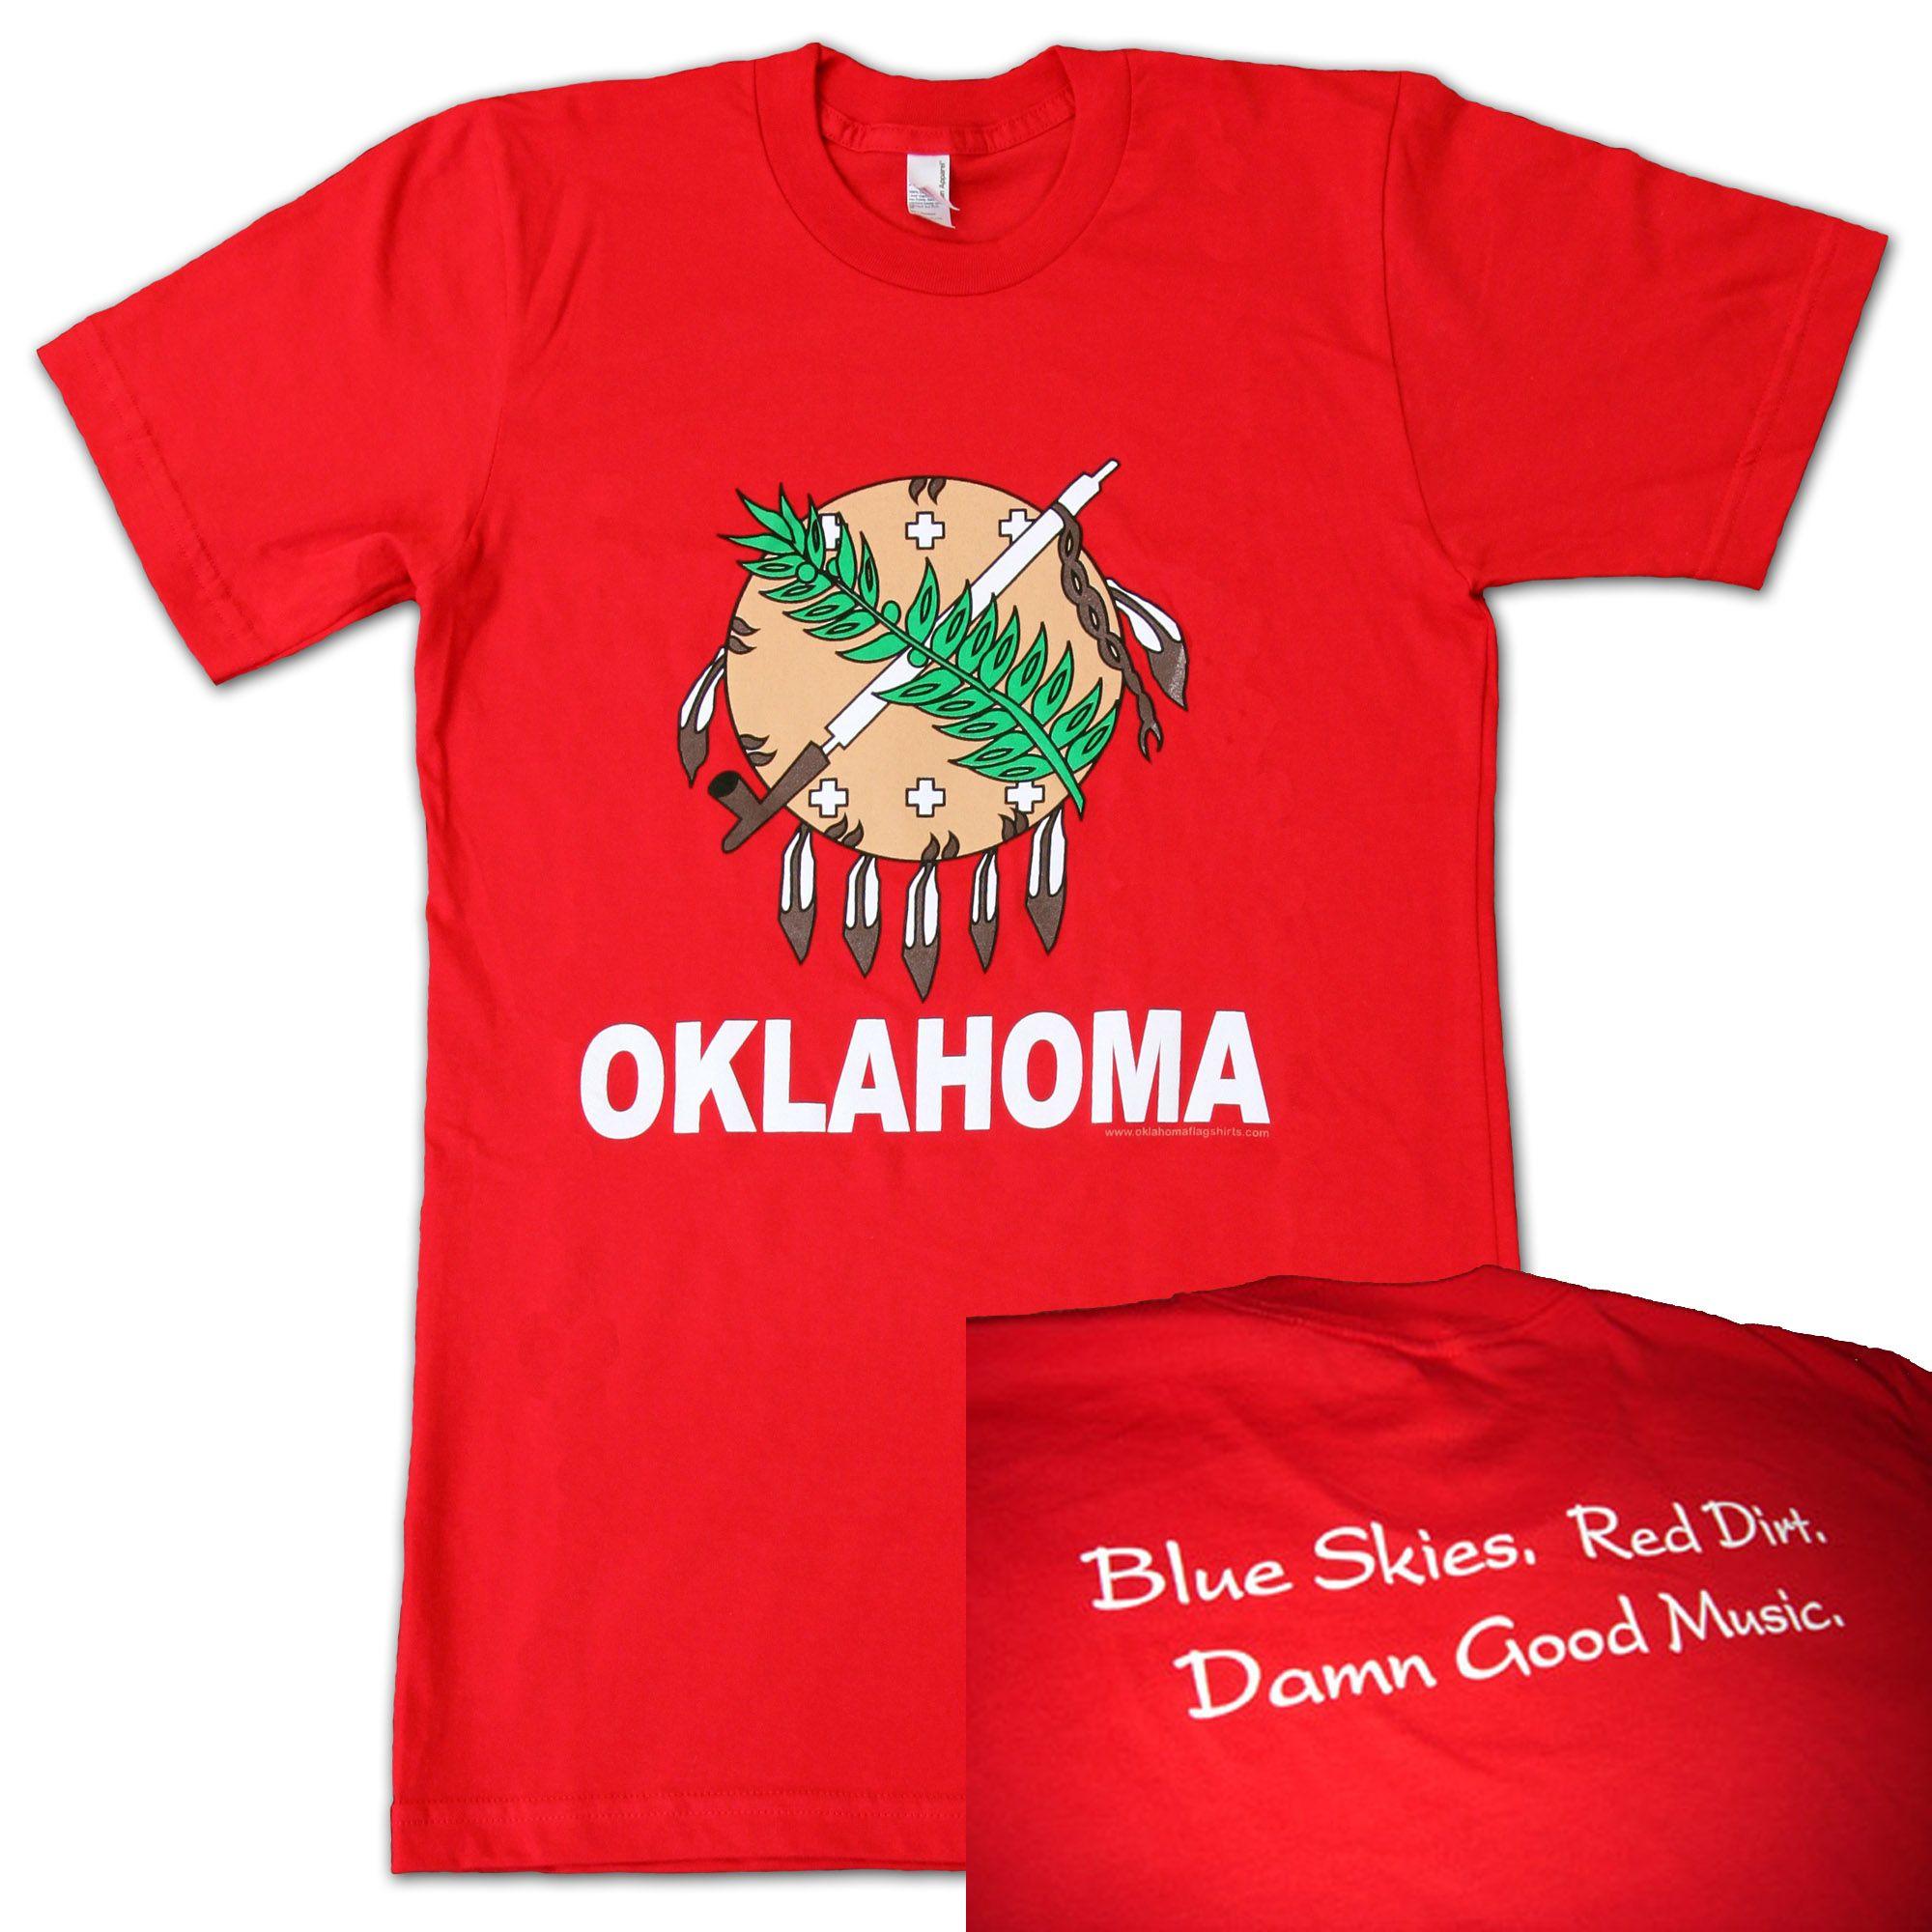 09f28e5f Oklahoma - blue skies, red dirt, damn good music. (This site has lots of  good Oklahoma shirts)